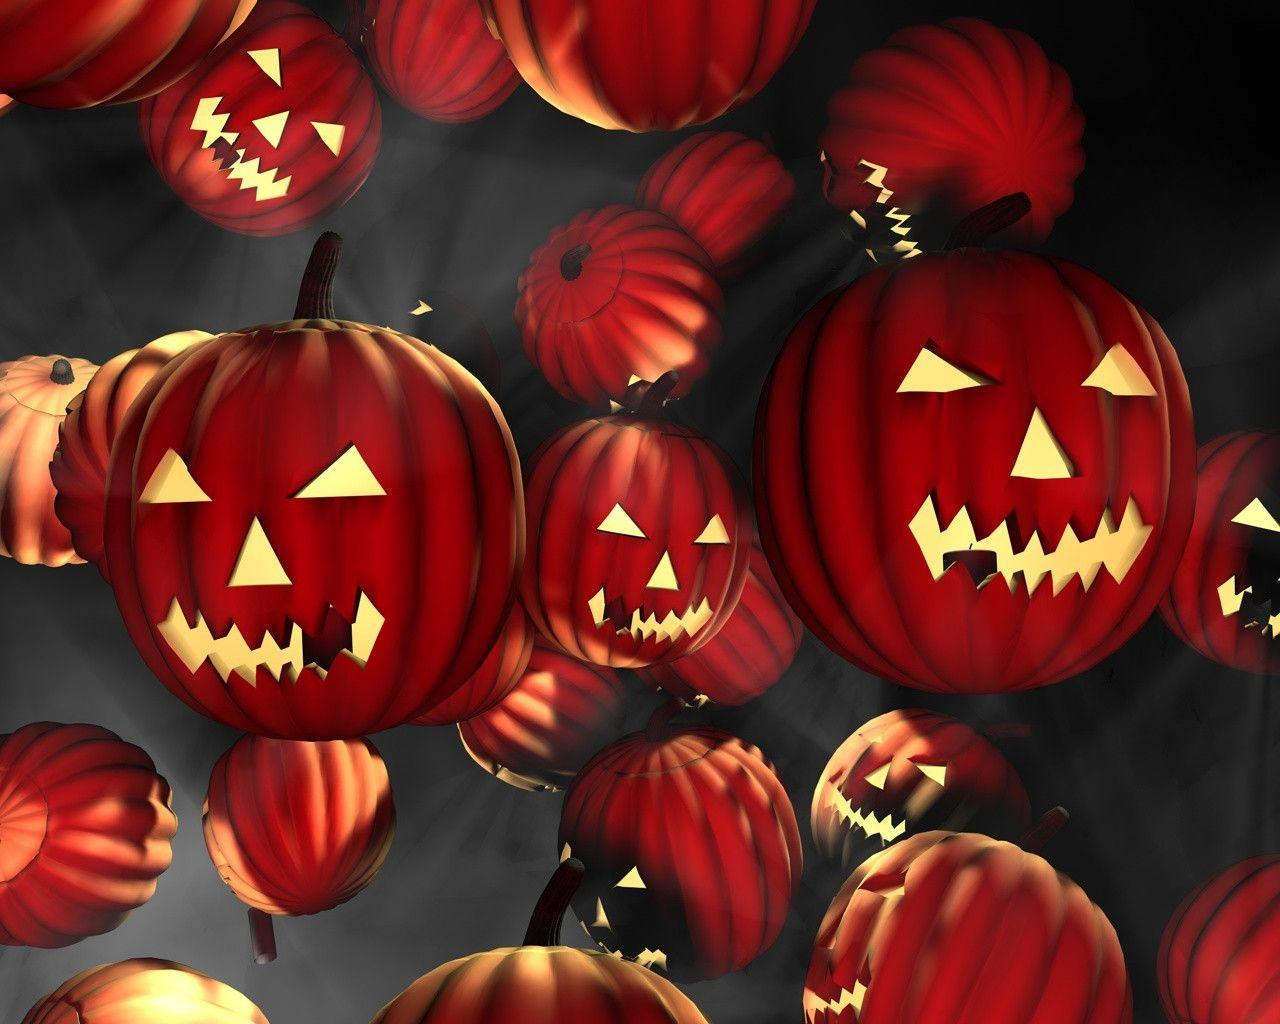 Free Halloween Wallpapers Screensavers - Wallpaper Cave